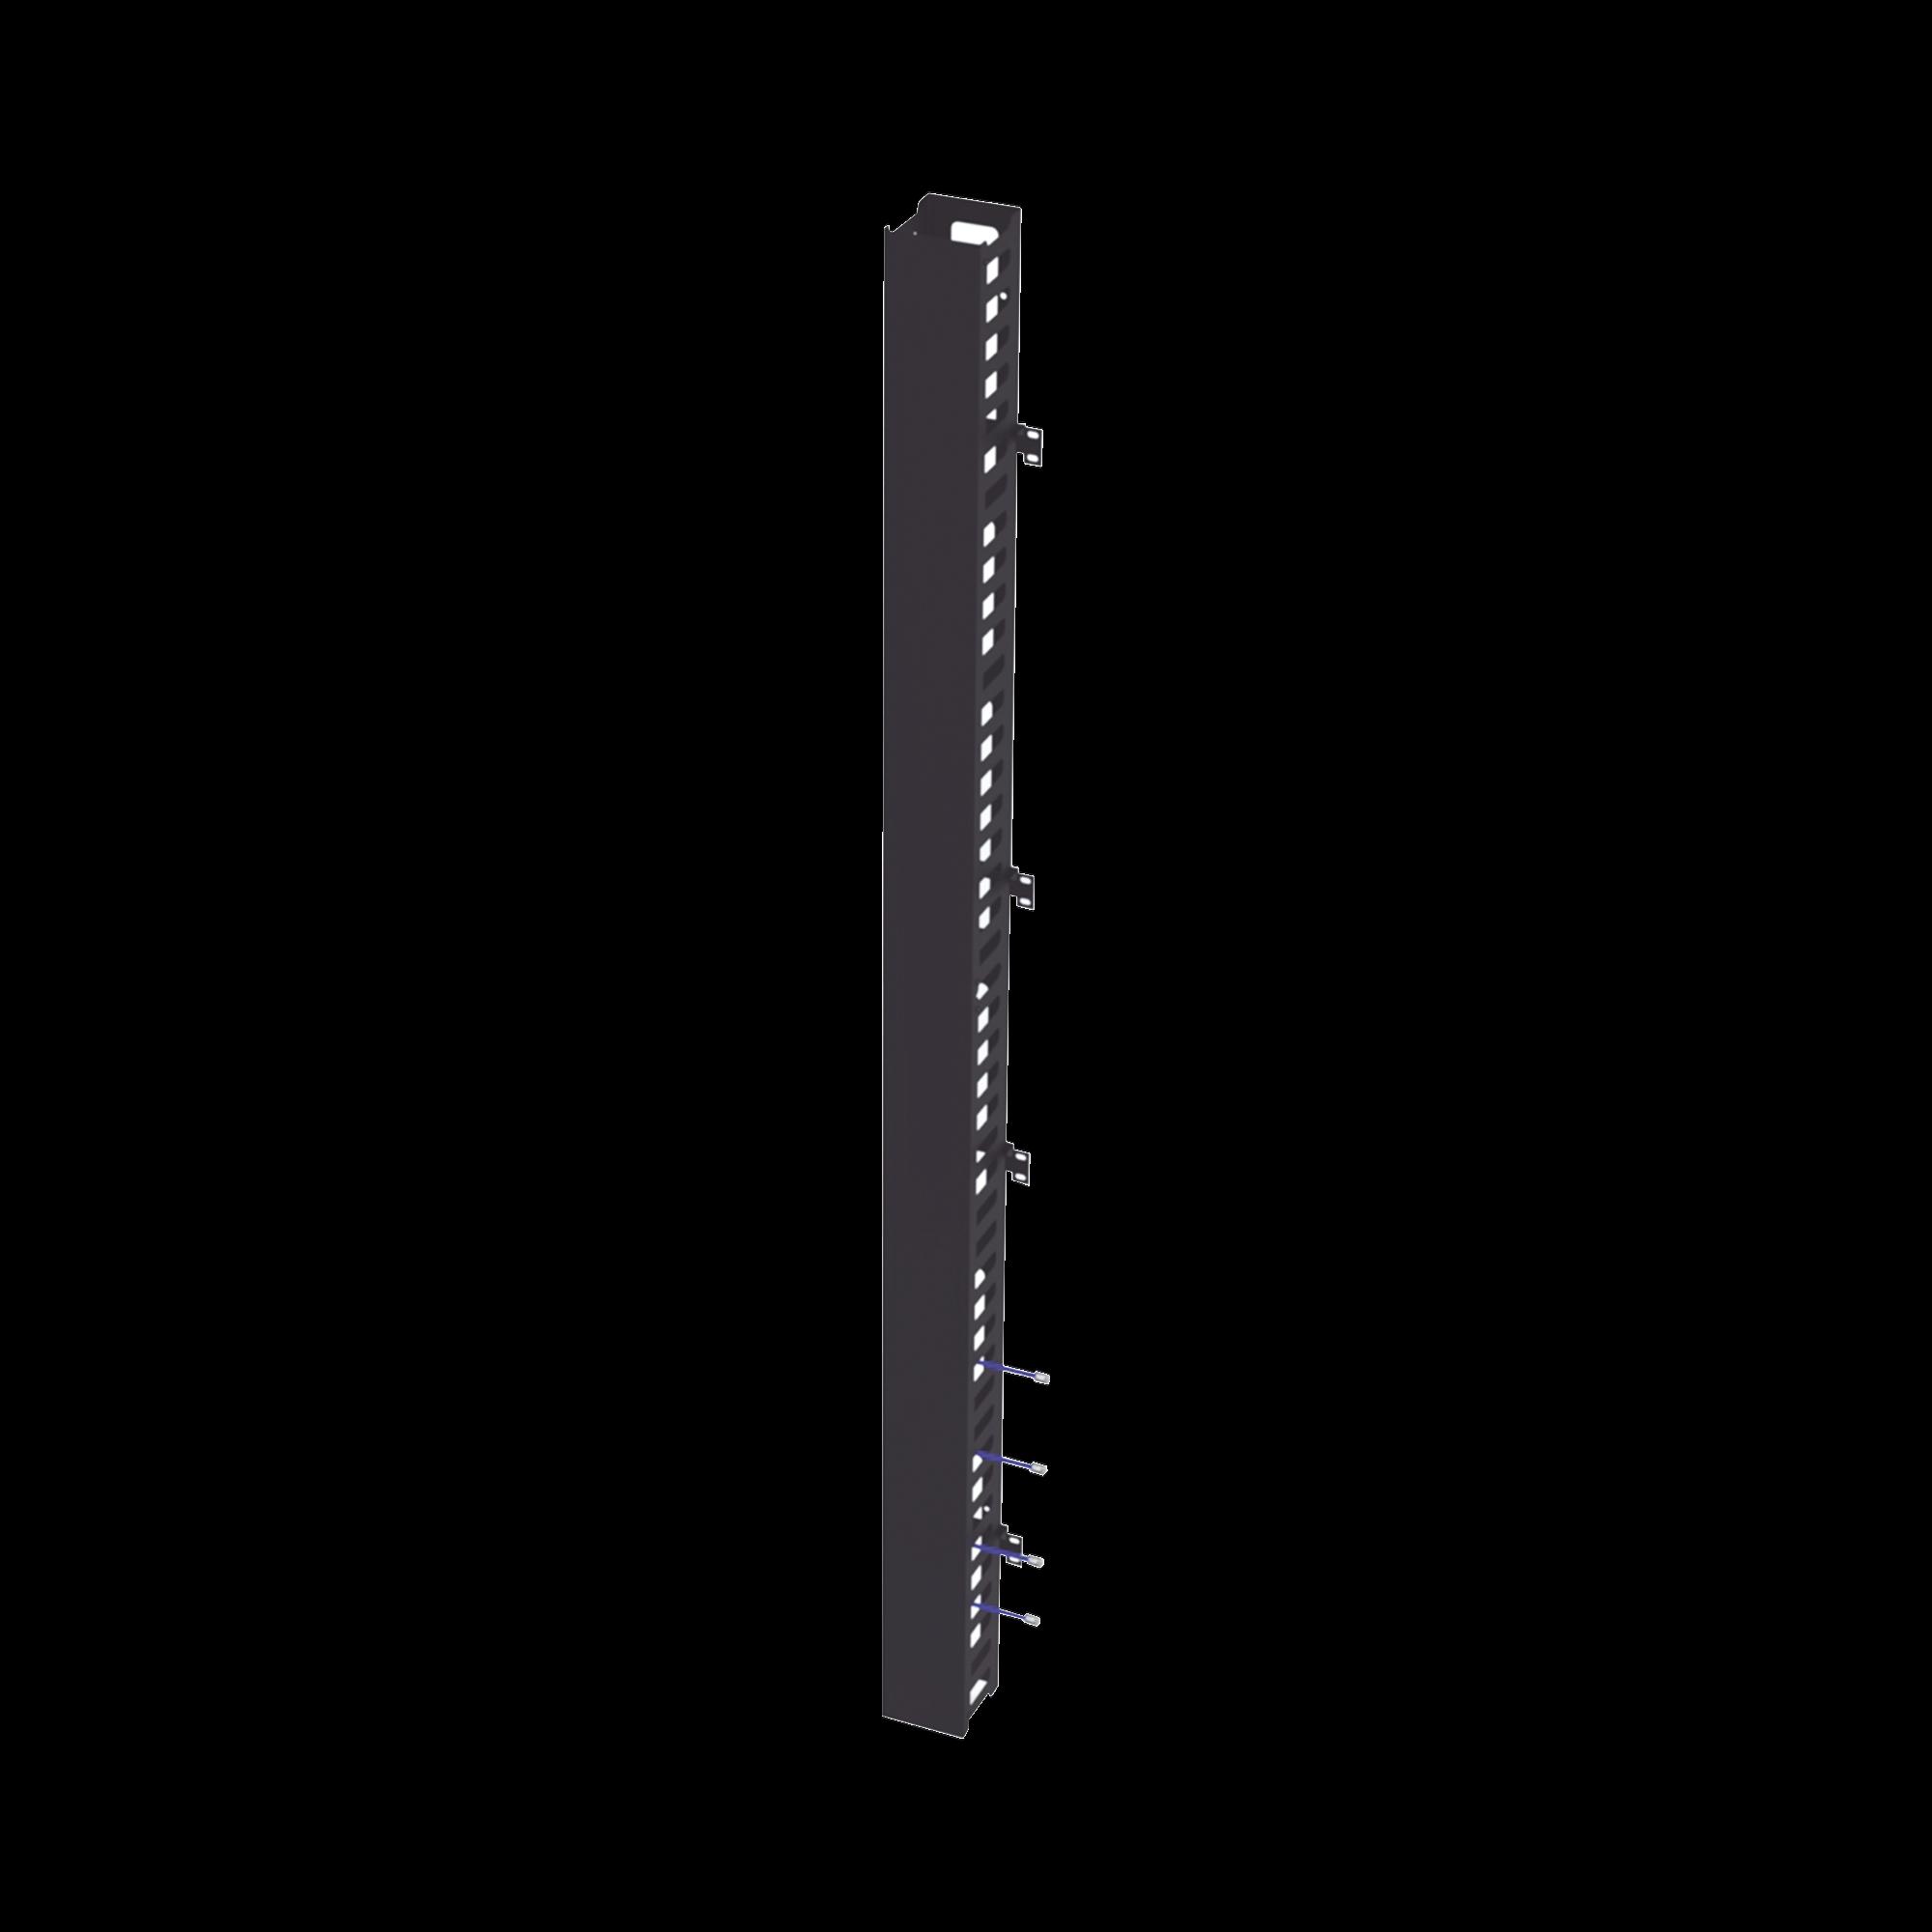 Kit Organizador Vertical de Cable Sencillo para Rack Abierto de 45 Unidades para EIQR3245 y EIRL5545DR.